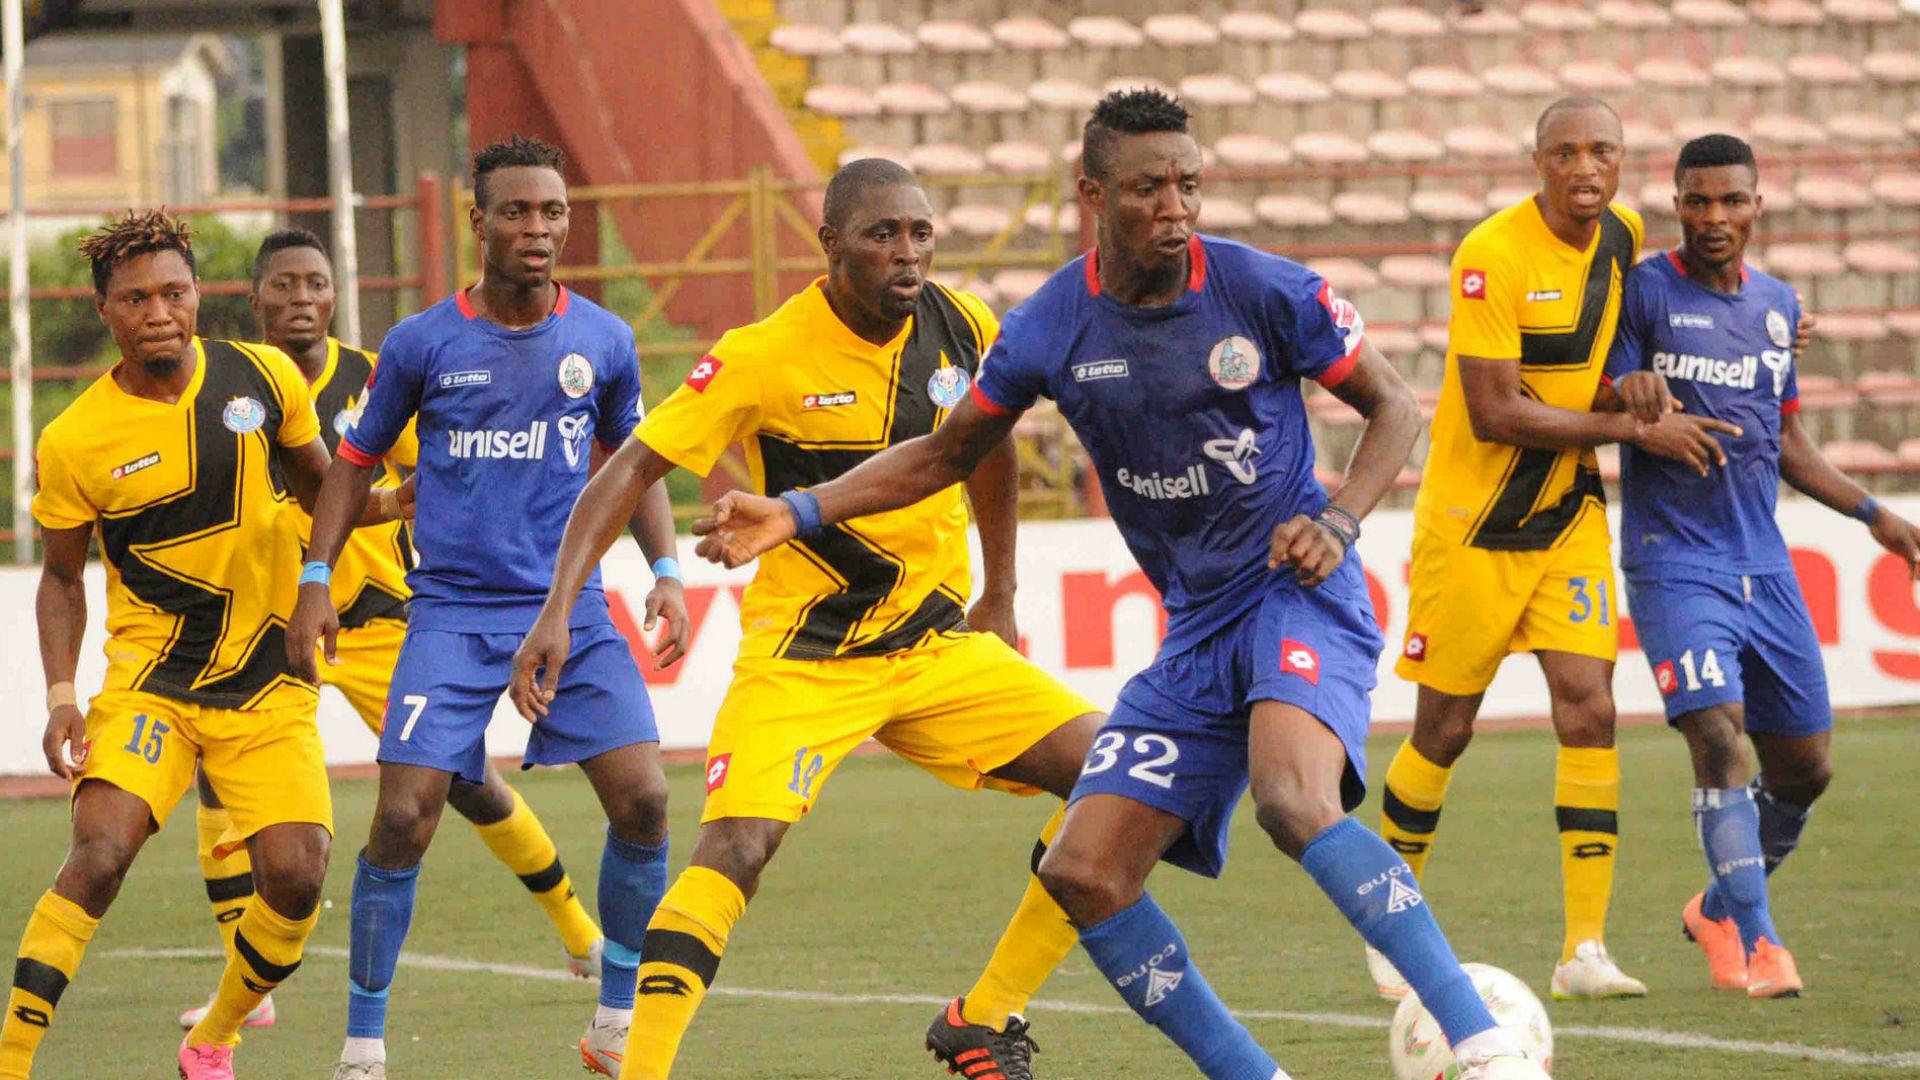 NPFL: Warri Wolves, Akwa Starlets, Jigawa Stars, Adamawa United gain promotion